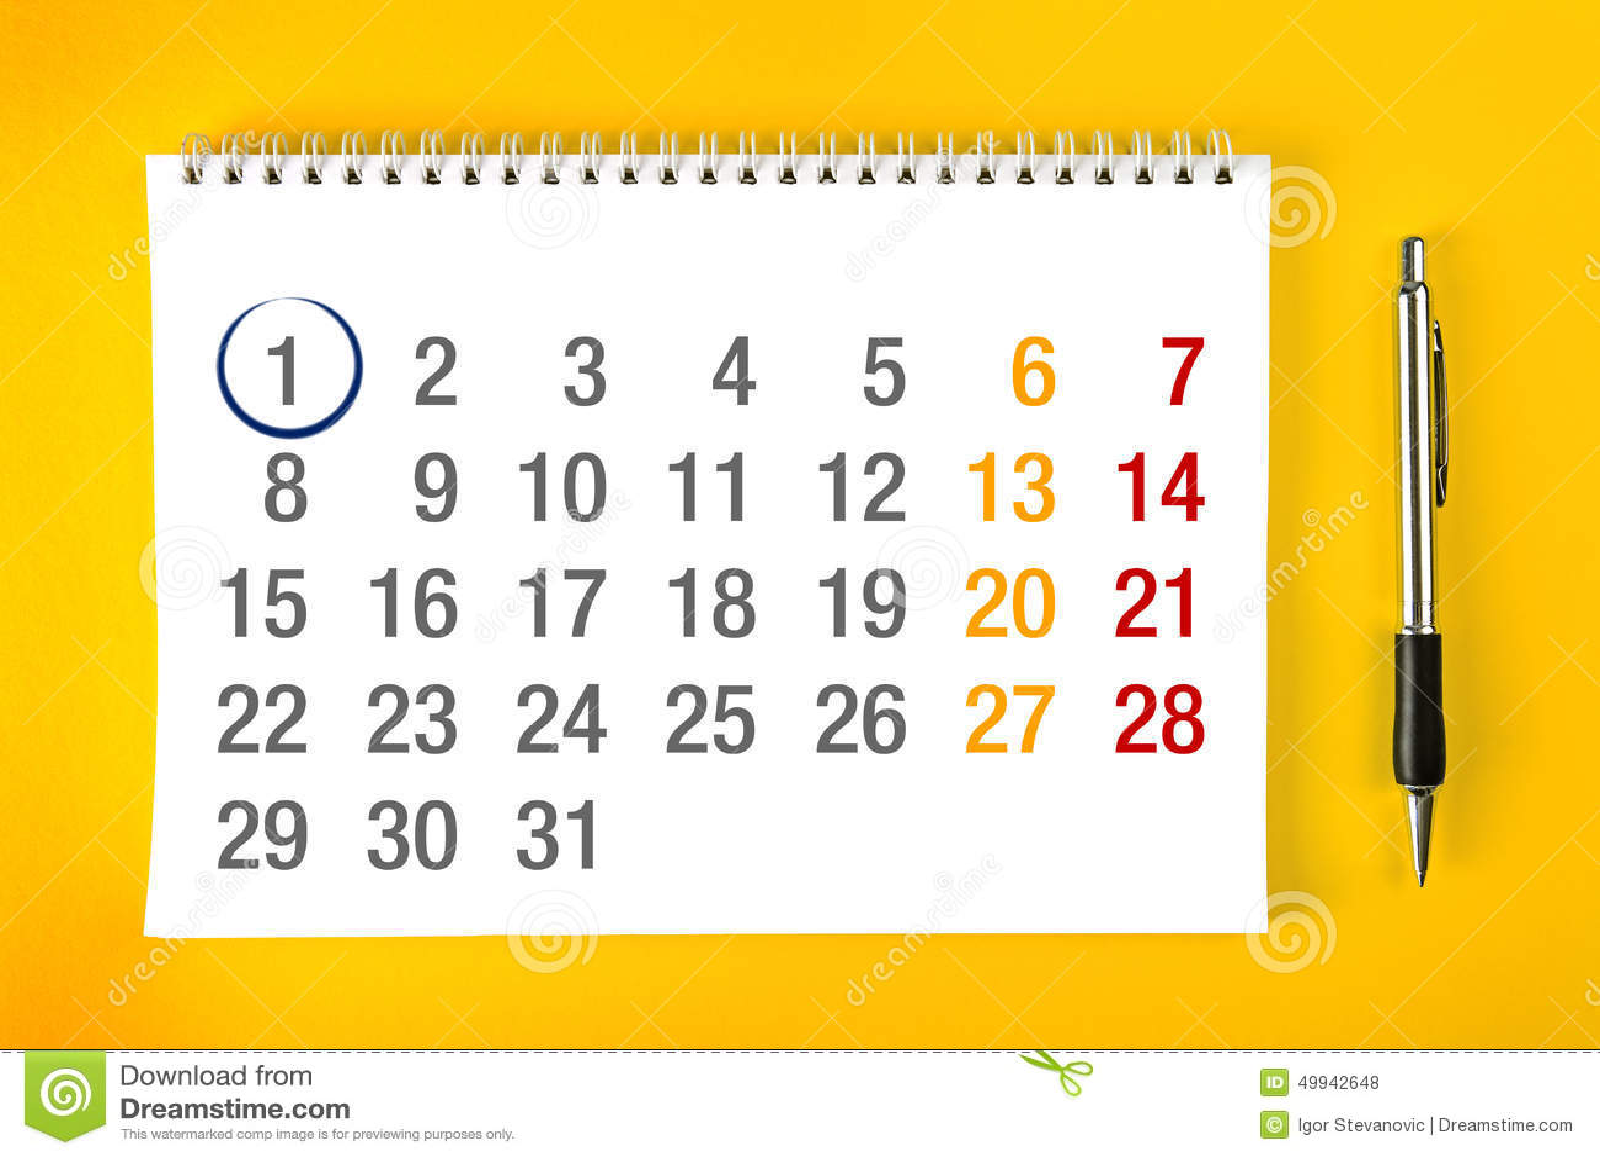 free 3 month calendar 2015